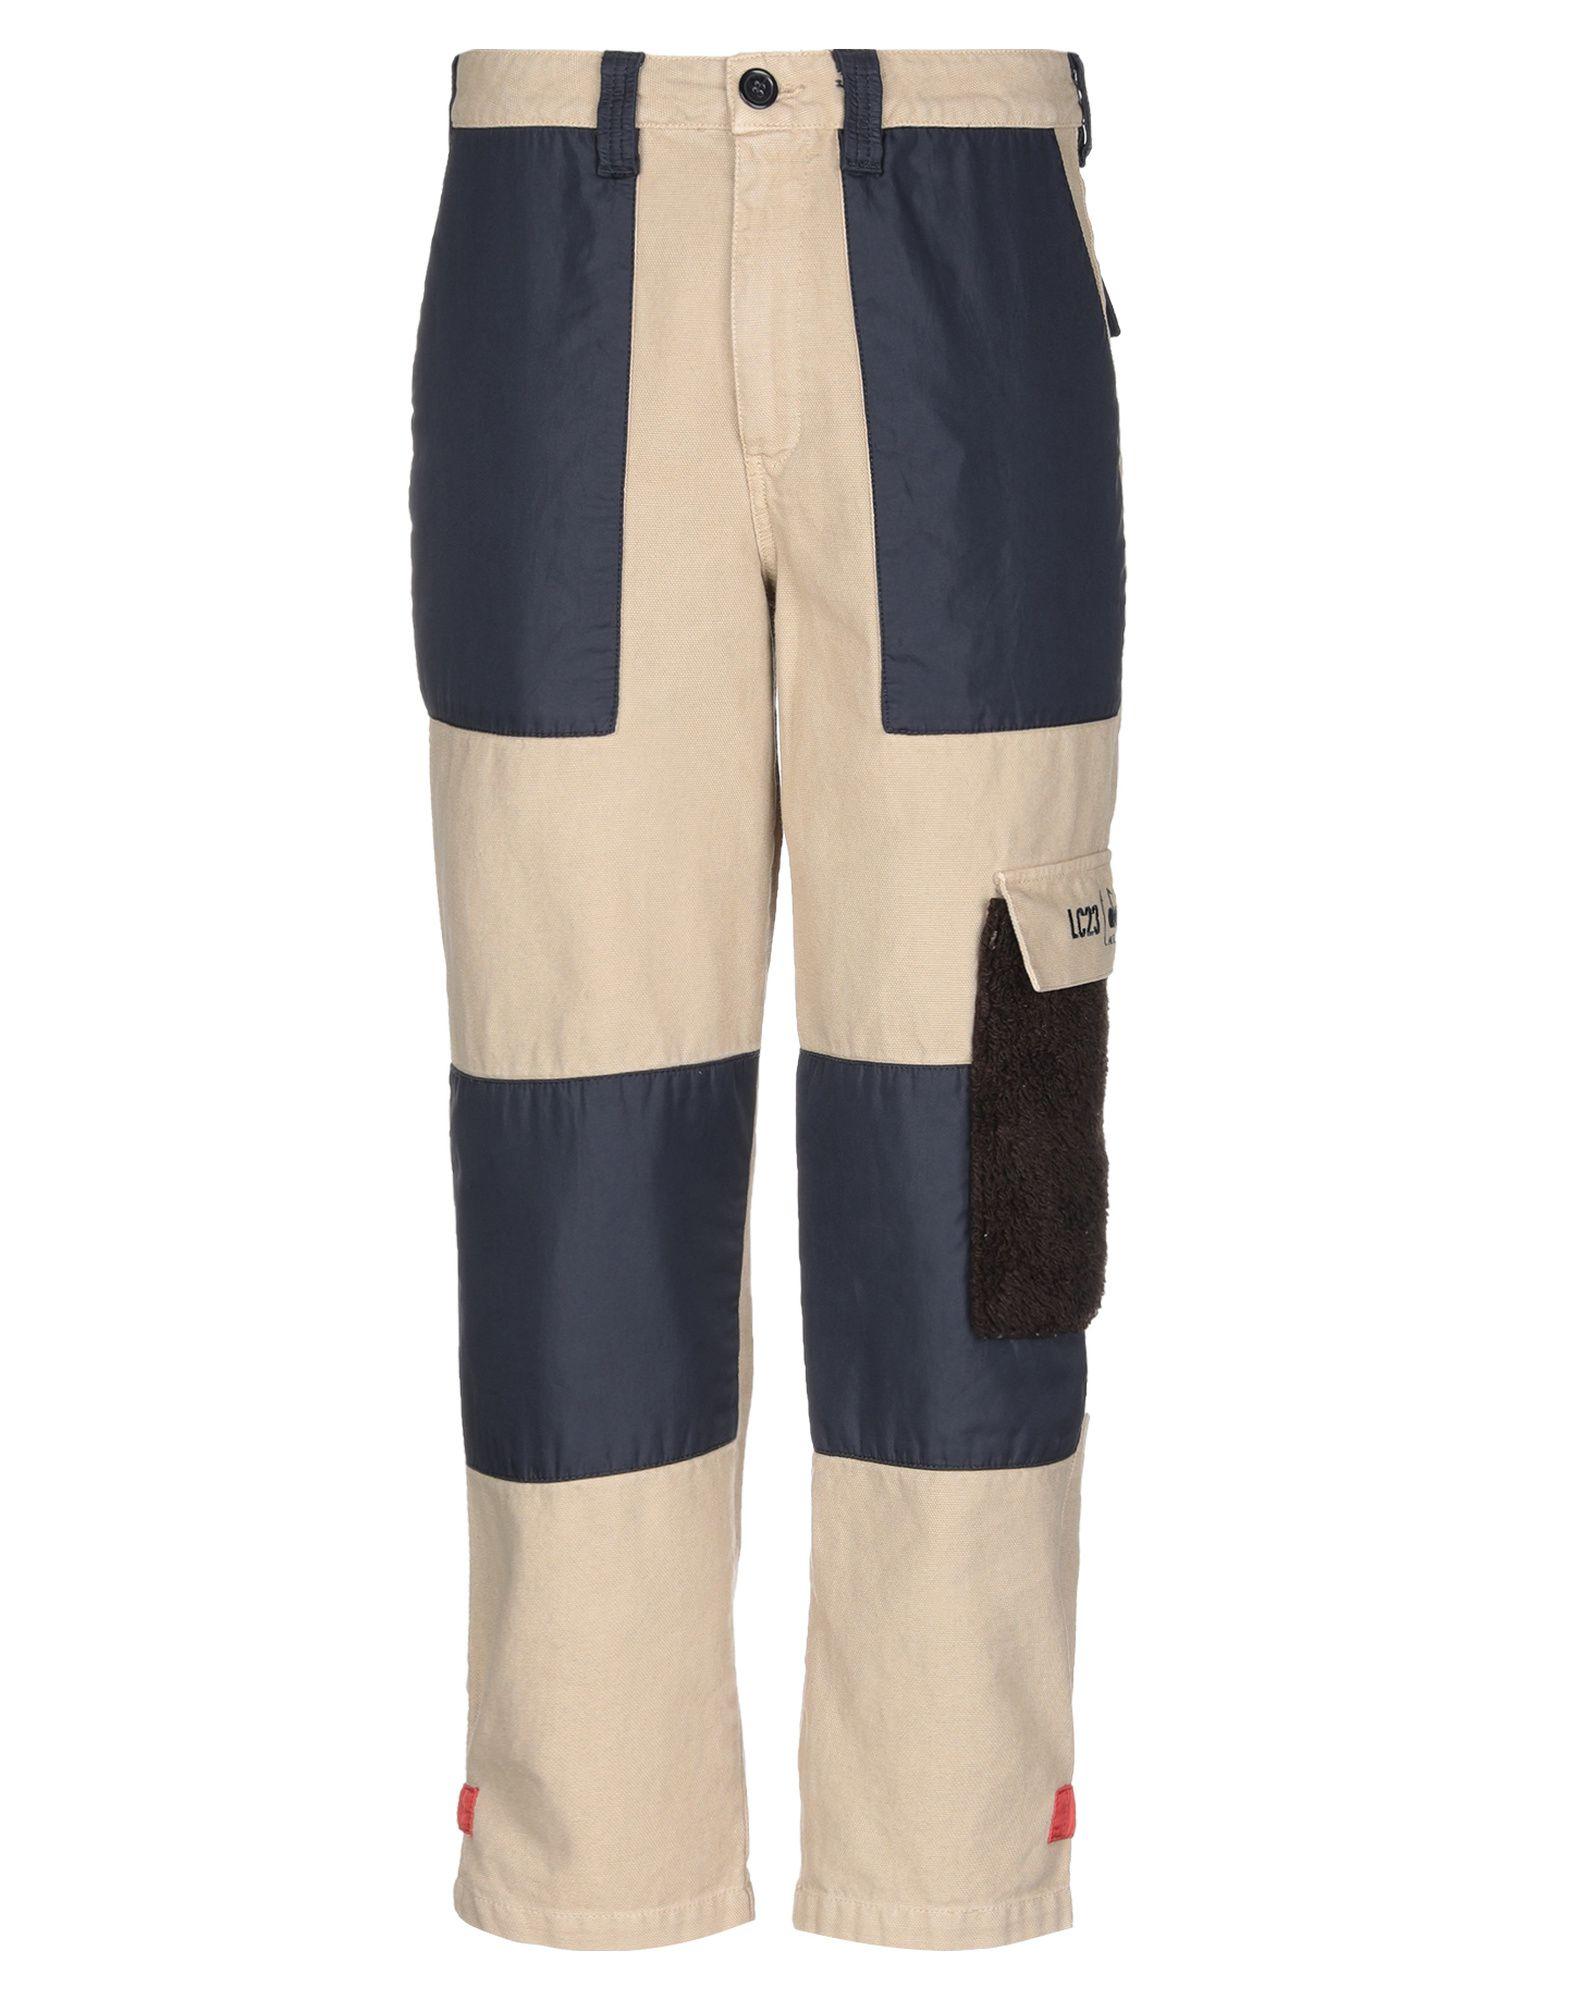 DIADORA HERITAGE x LC23 Повседневные брюки lc23 повседневные брюки